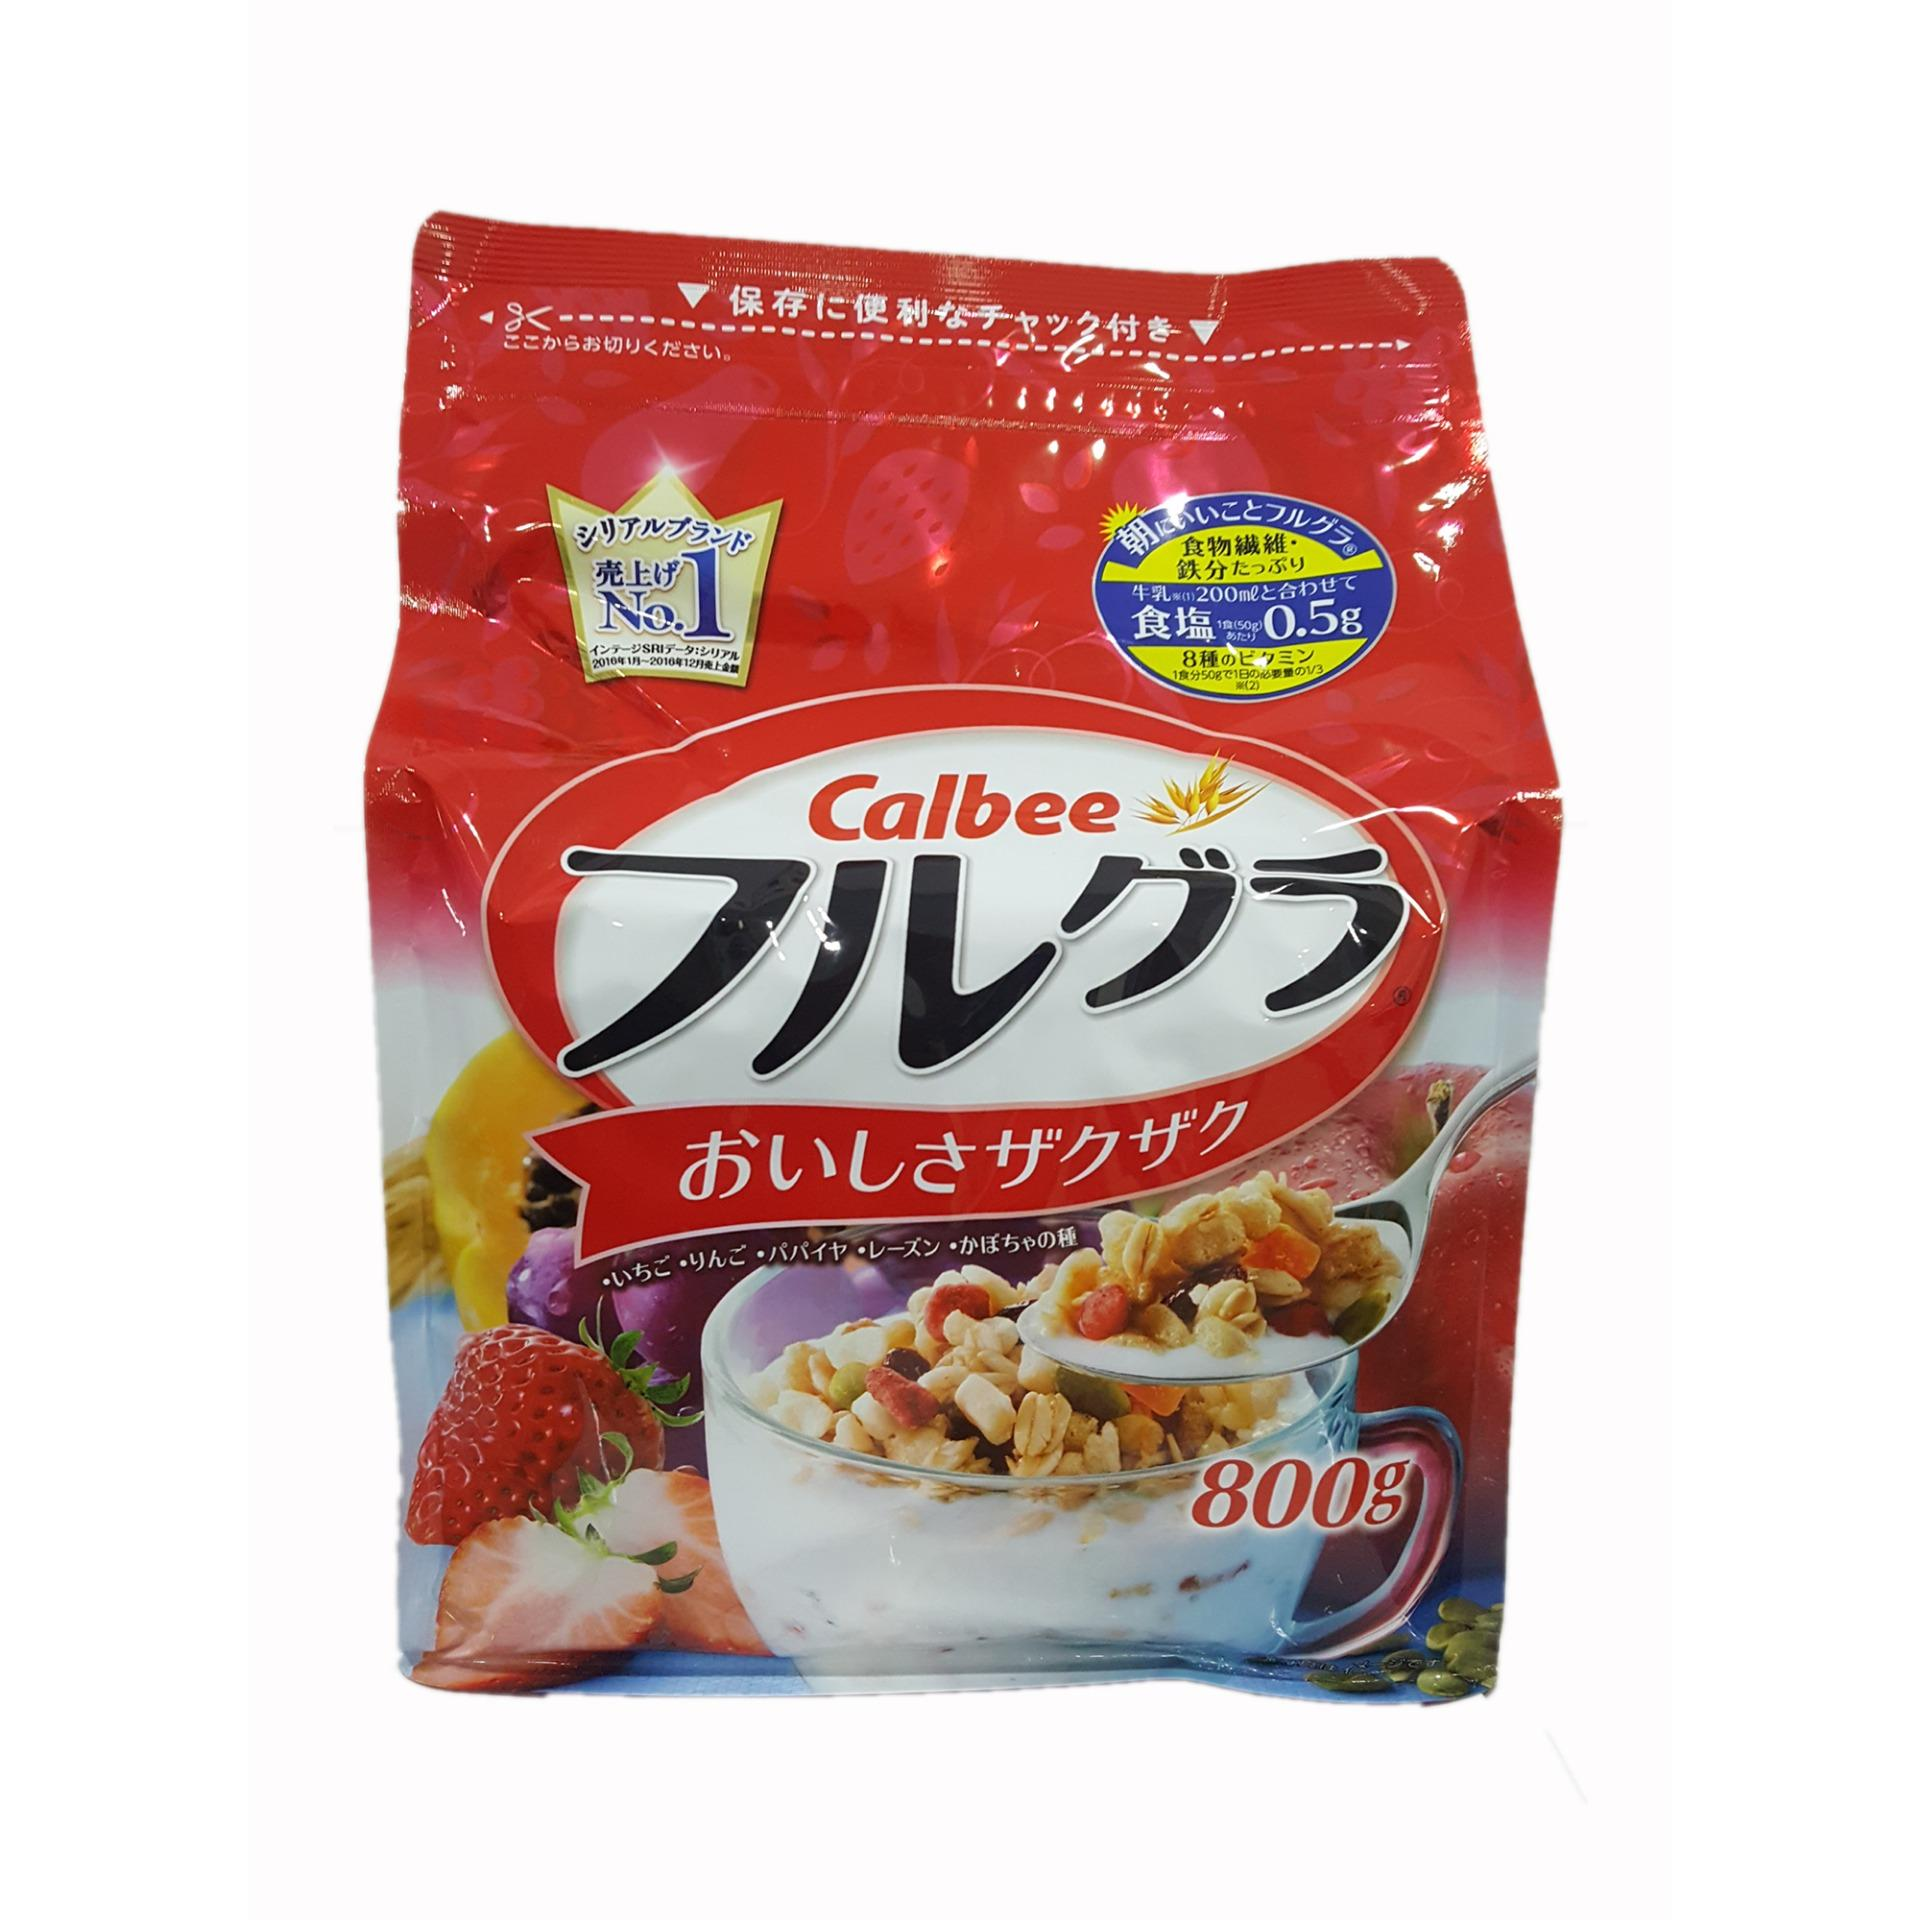 Ngũ cốc Calbee Nhật Bản 800g date T10 2018